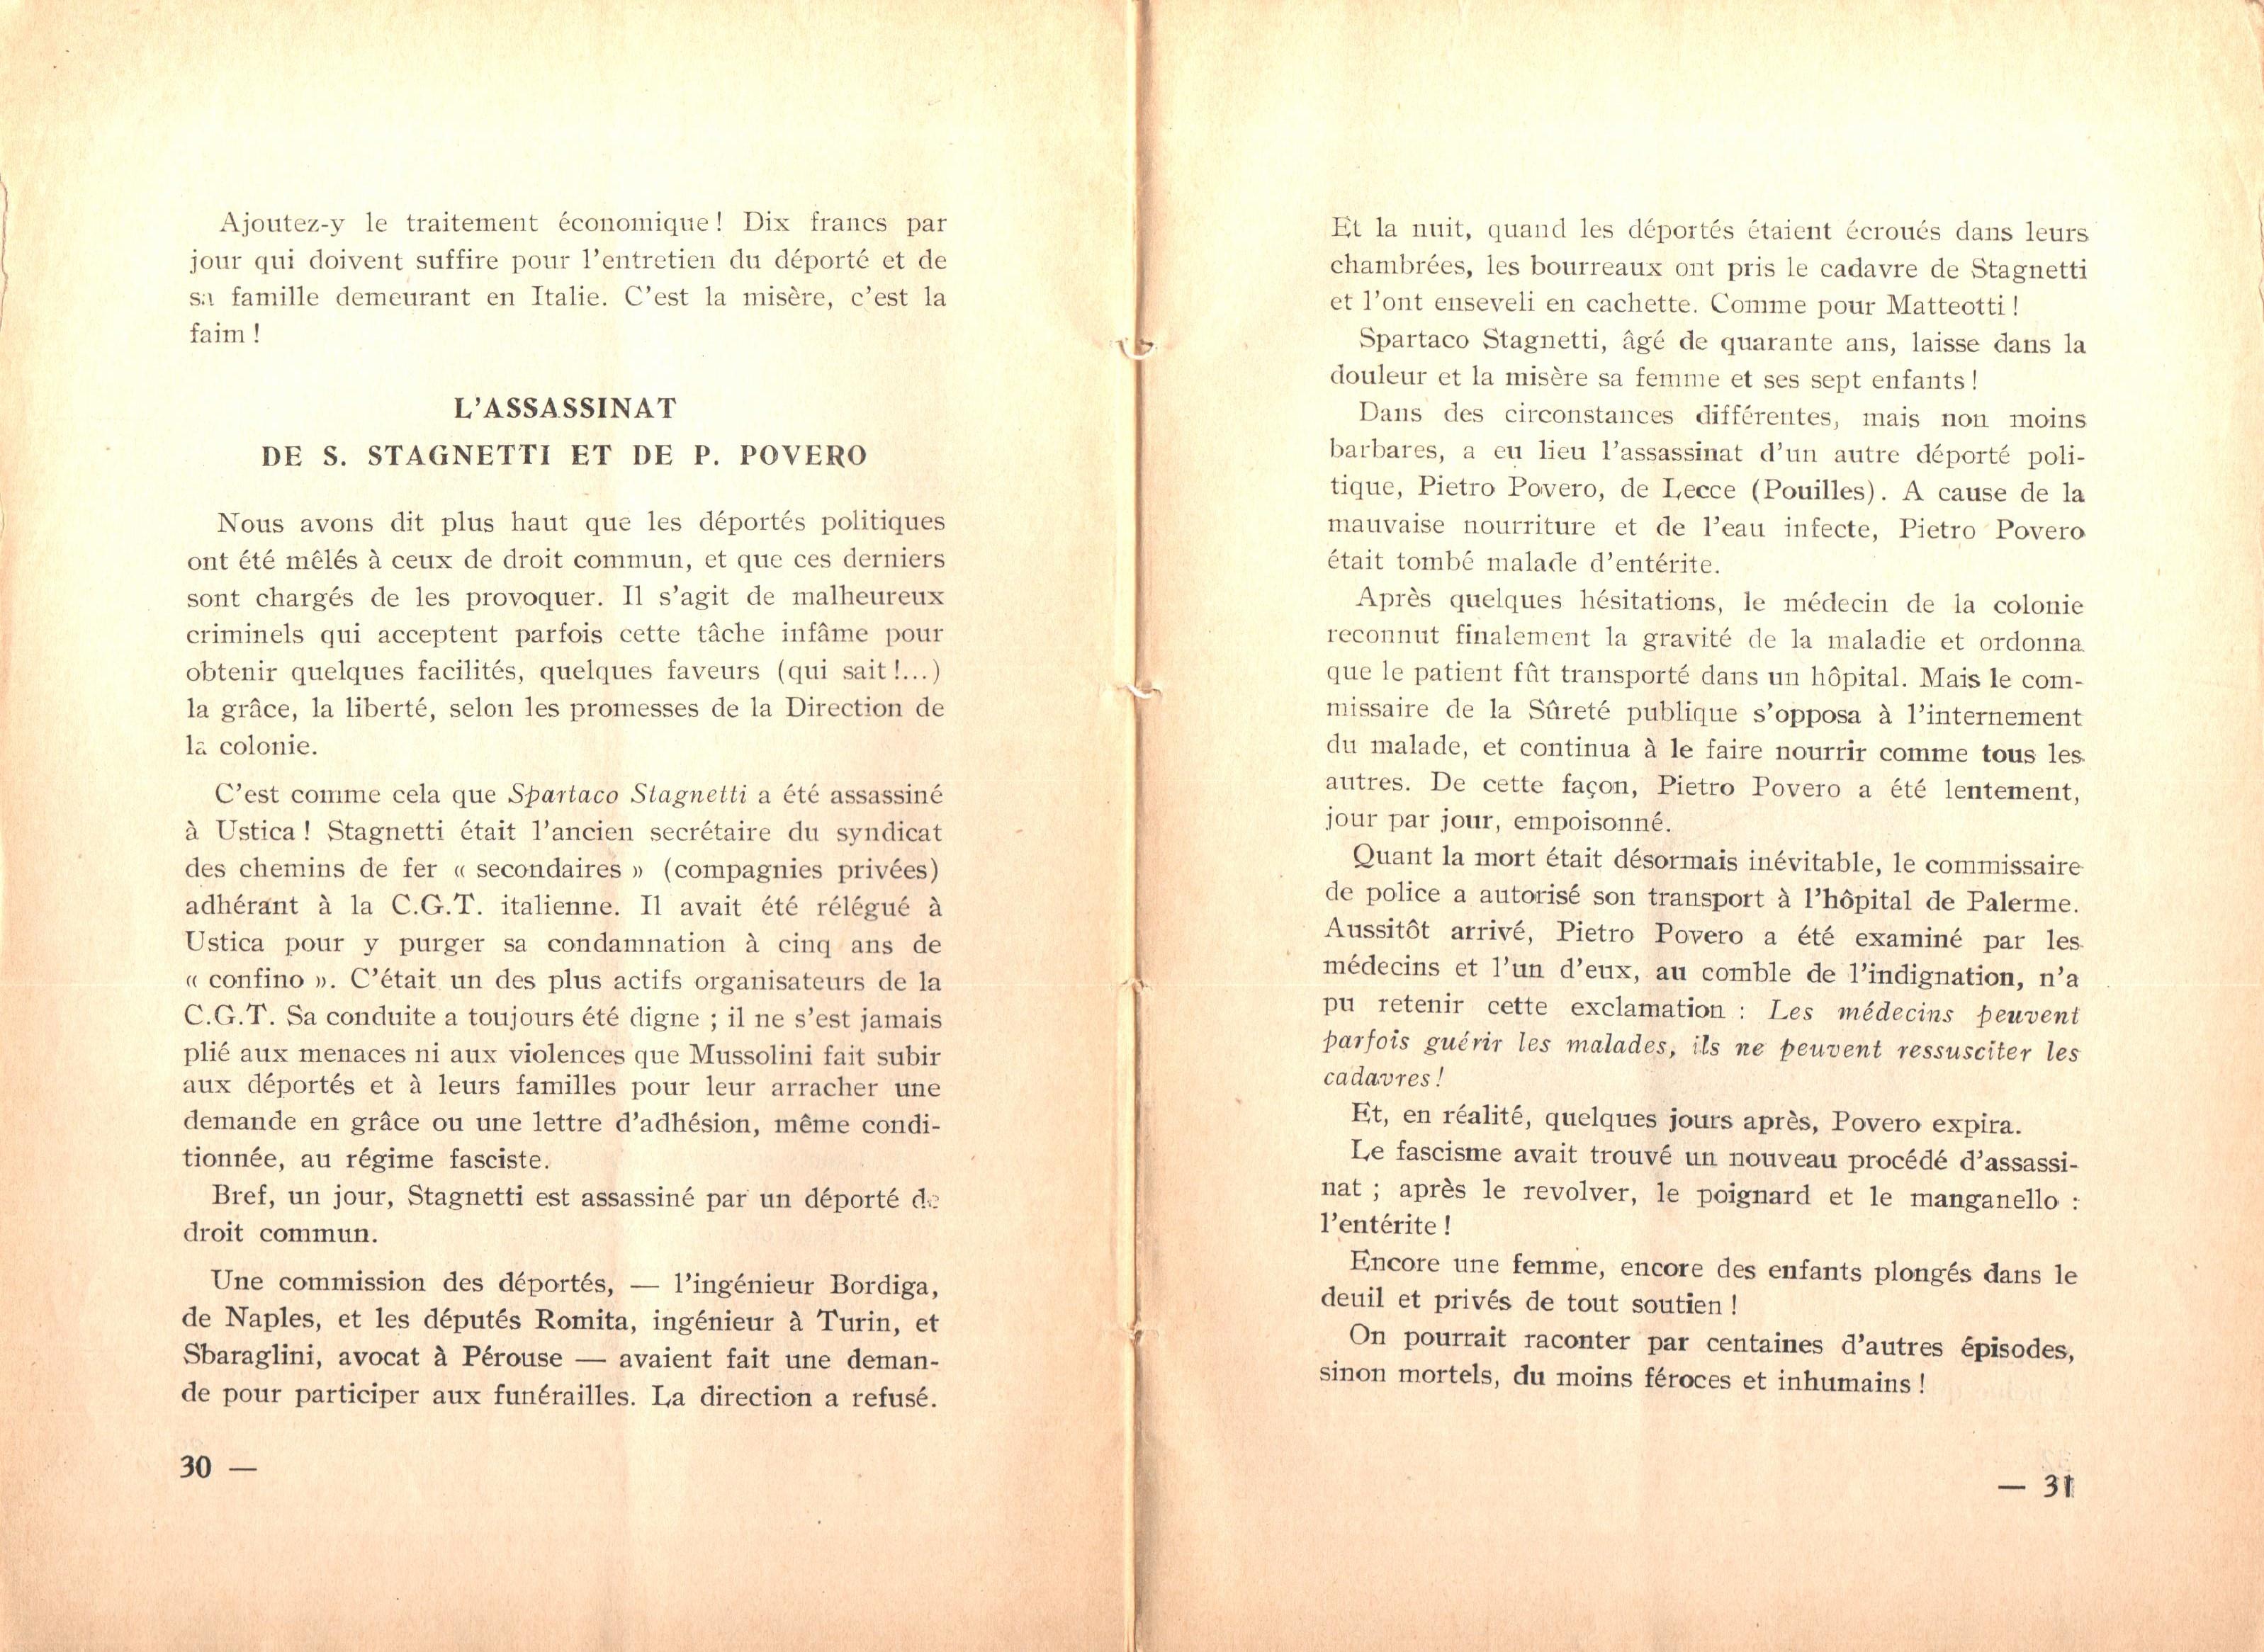 Nicola Cilla, Les «Cayennes» d'Italie - pag. 17